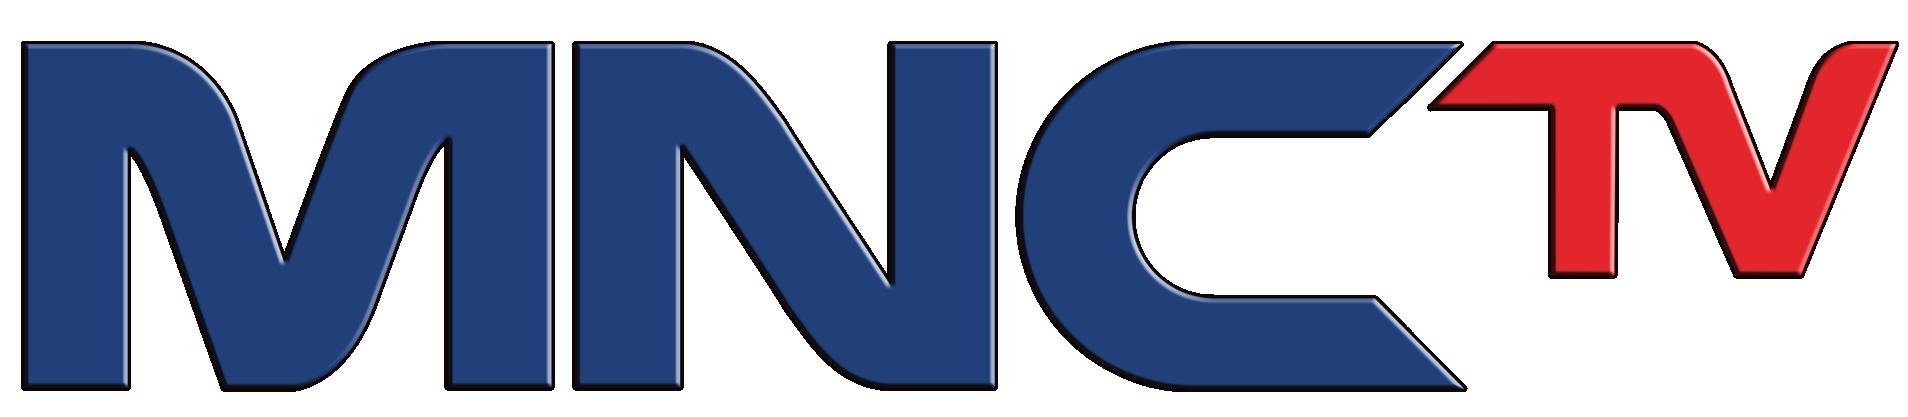 Web Nonton TV Online MNCTV Live